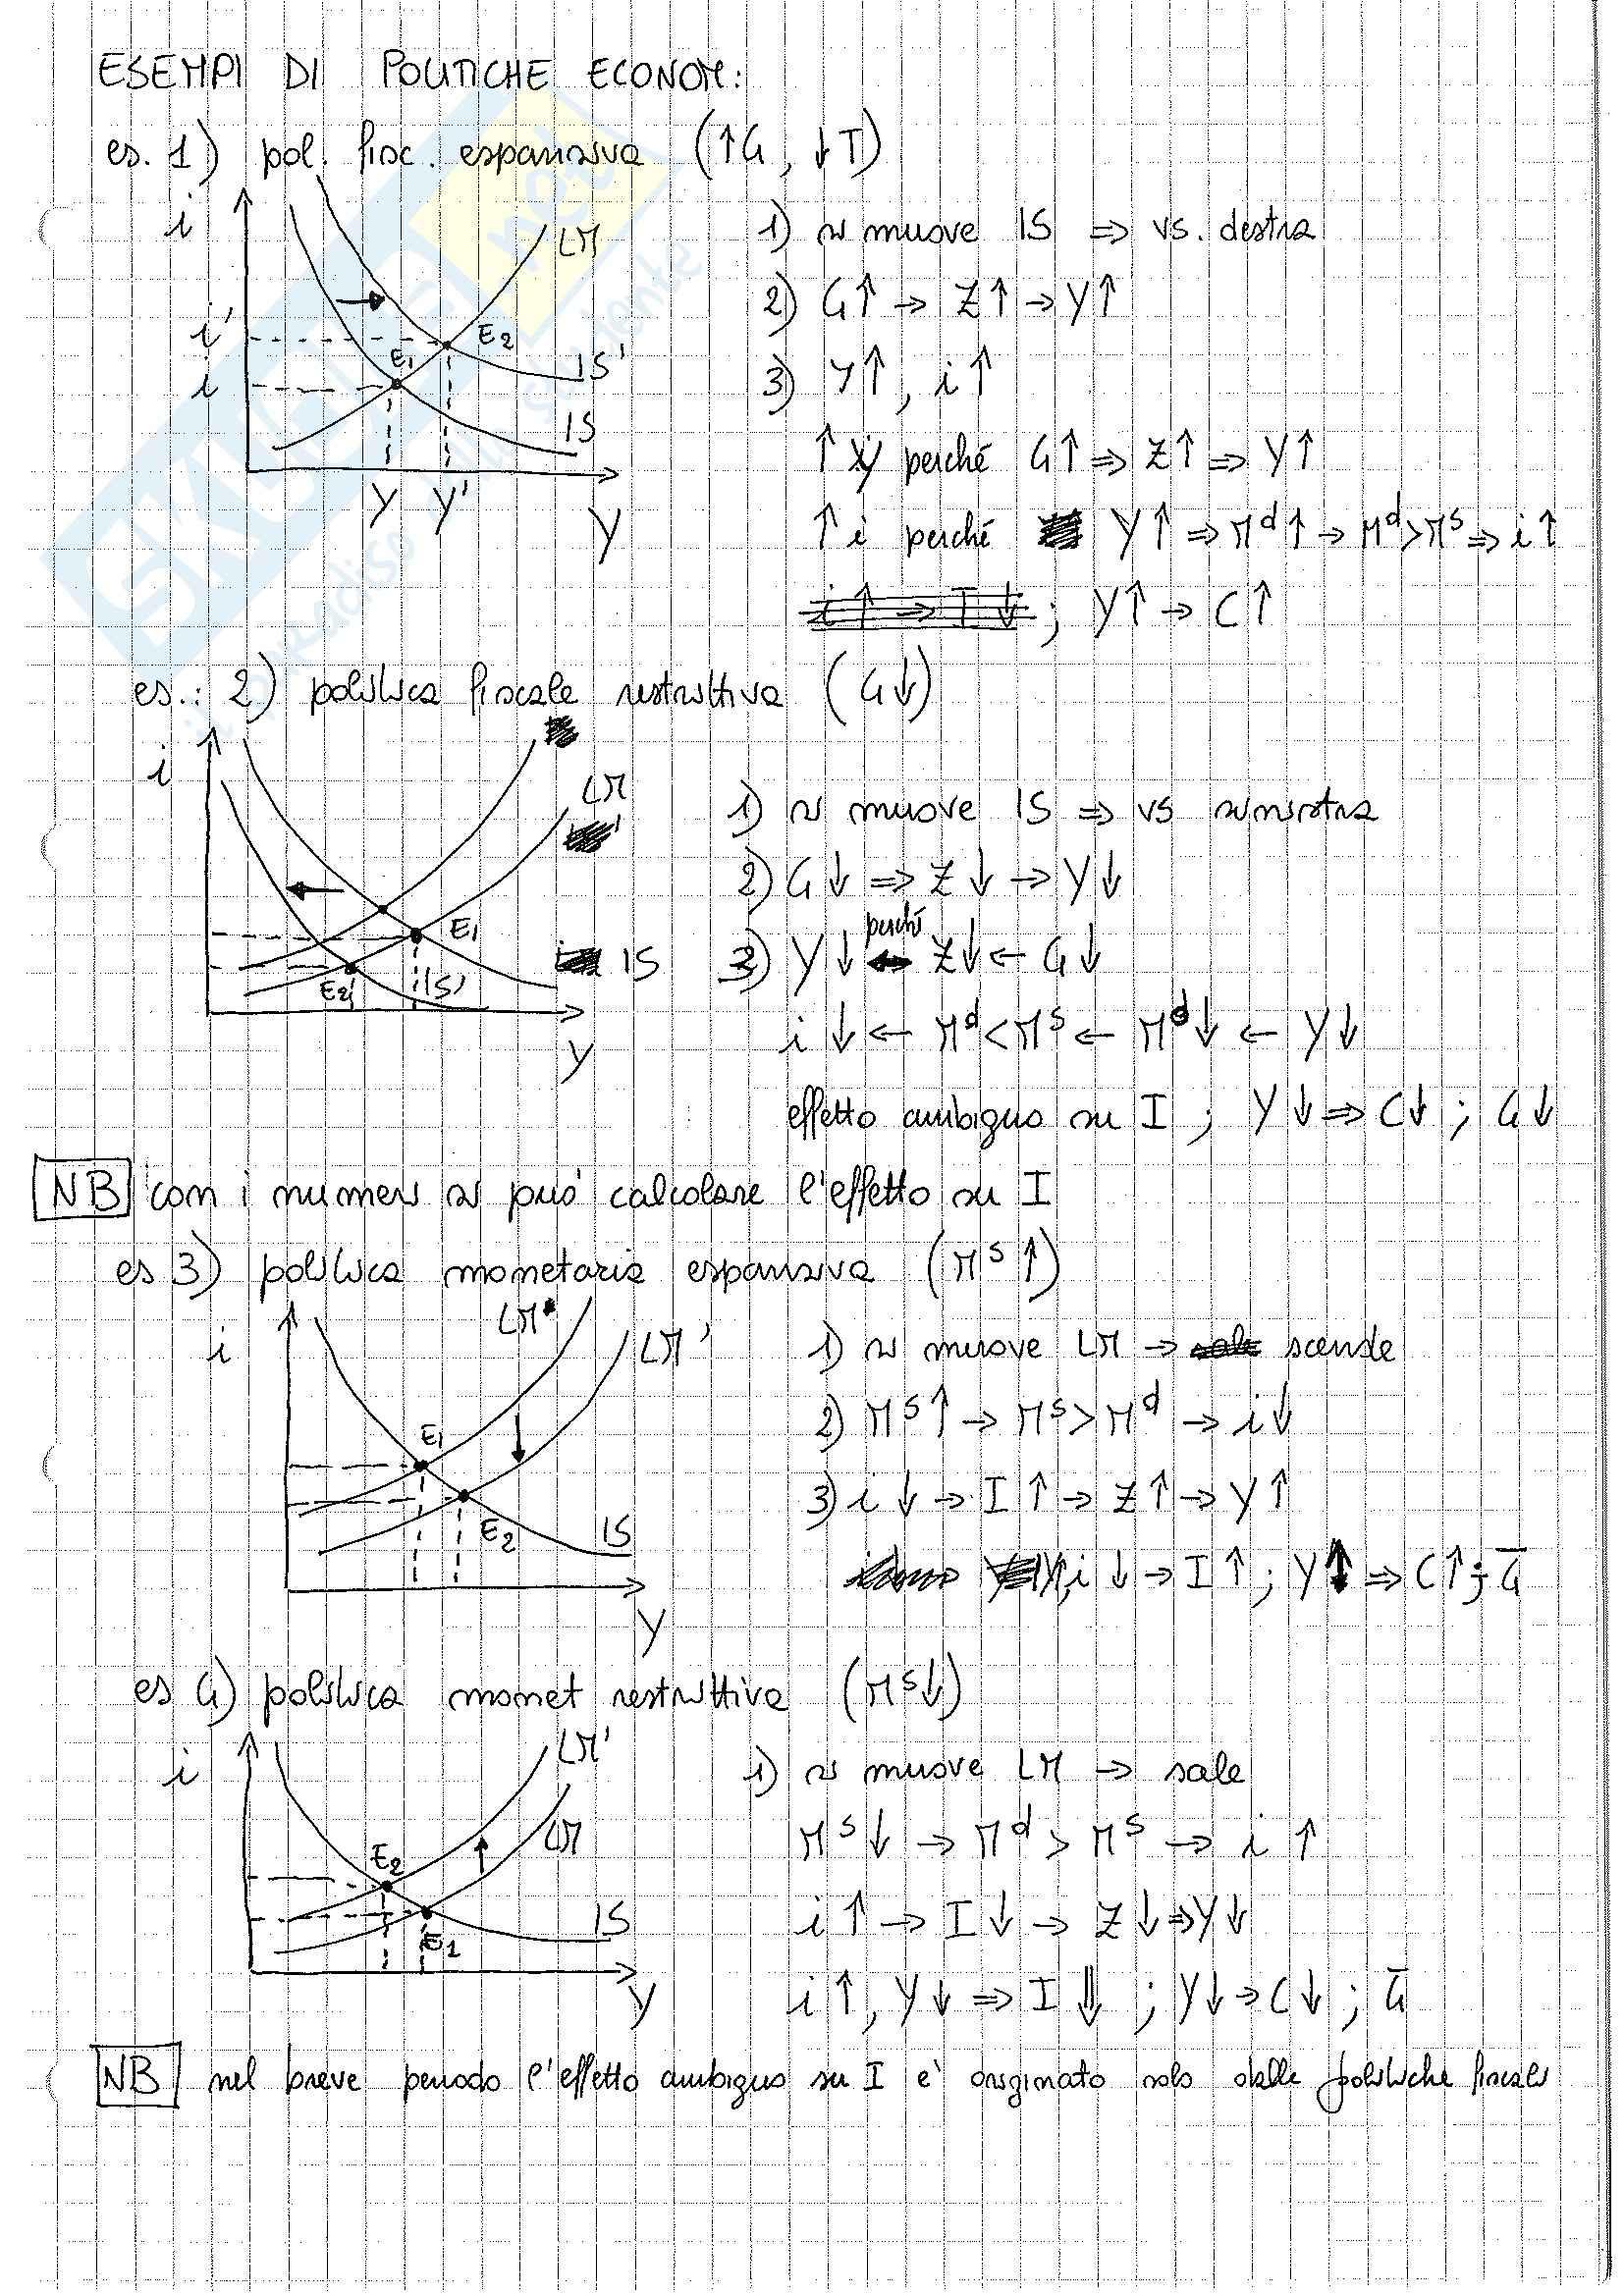 MB116: Appunti di Macroeconomia Pag. 21